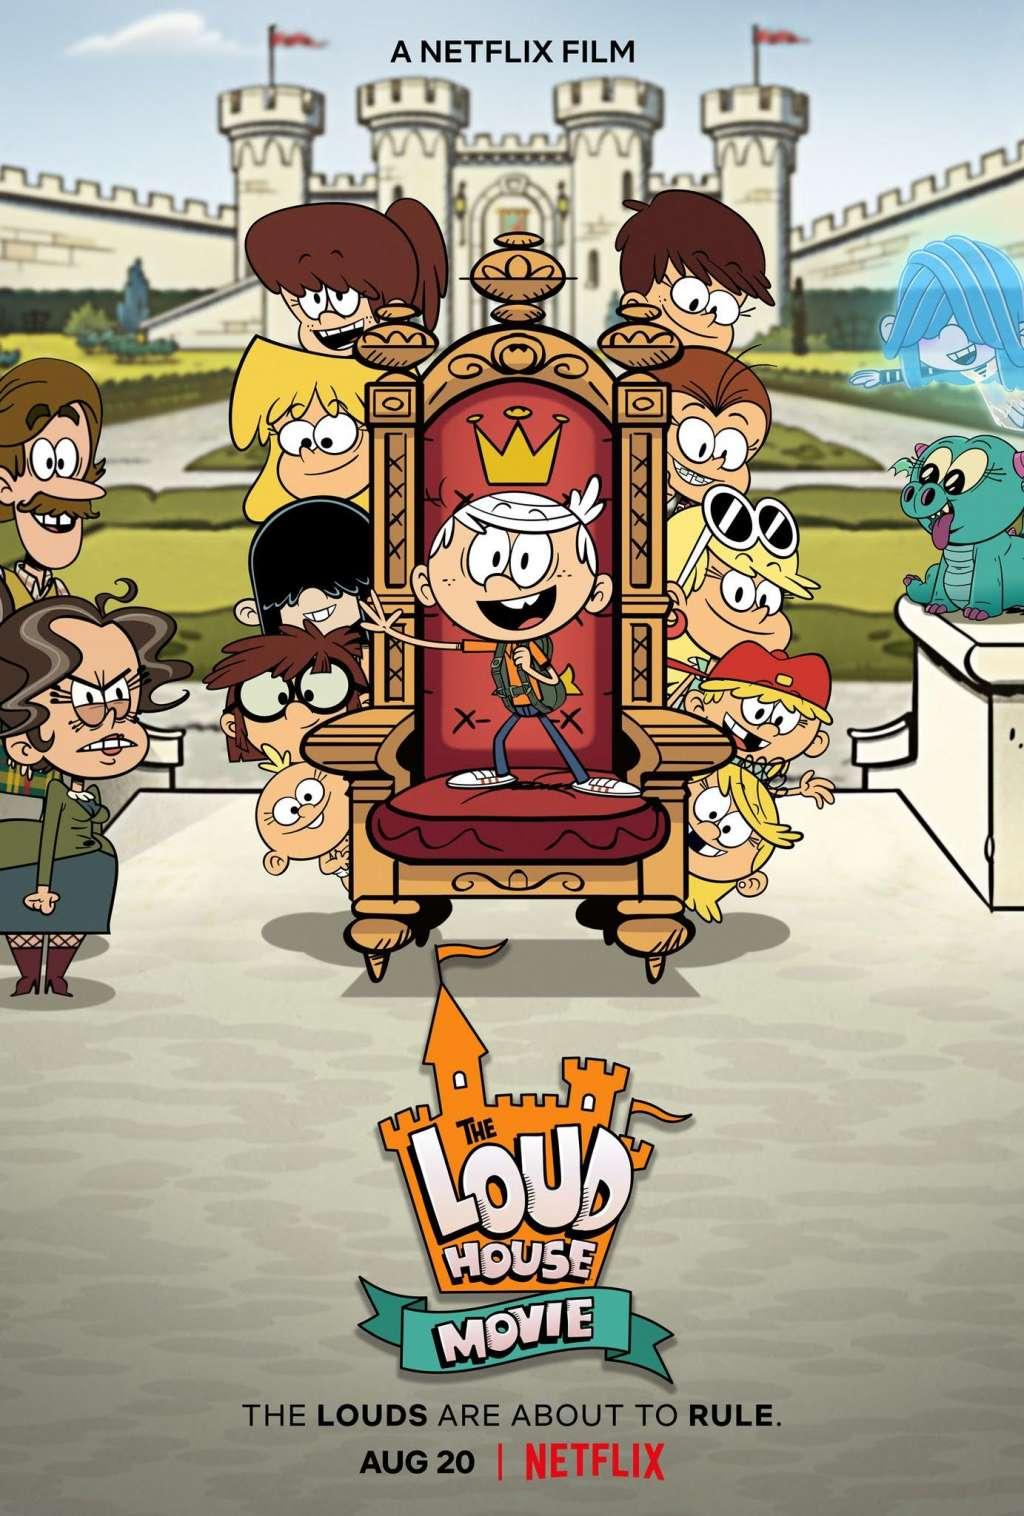 The Loud House Movie kapak